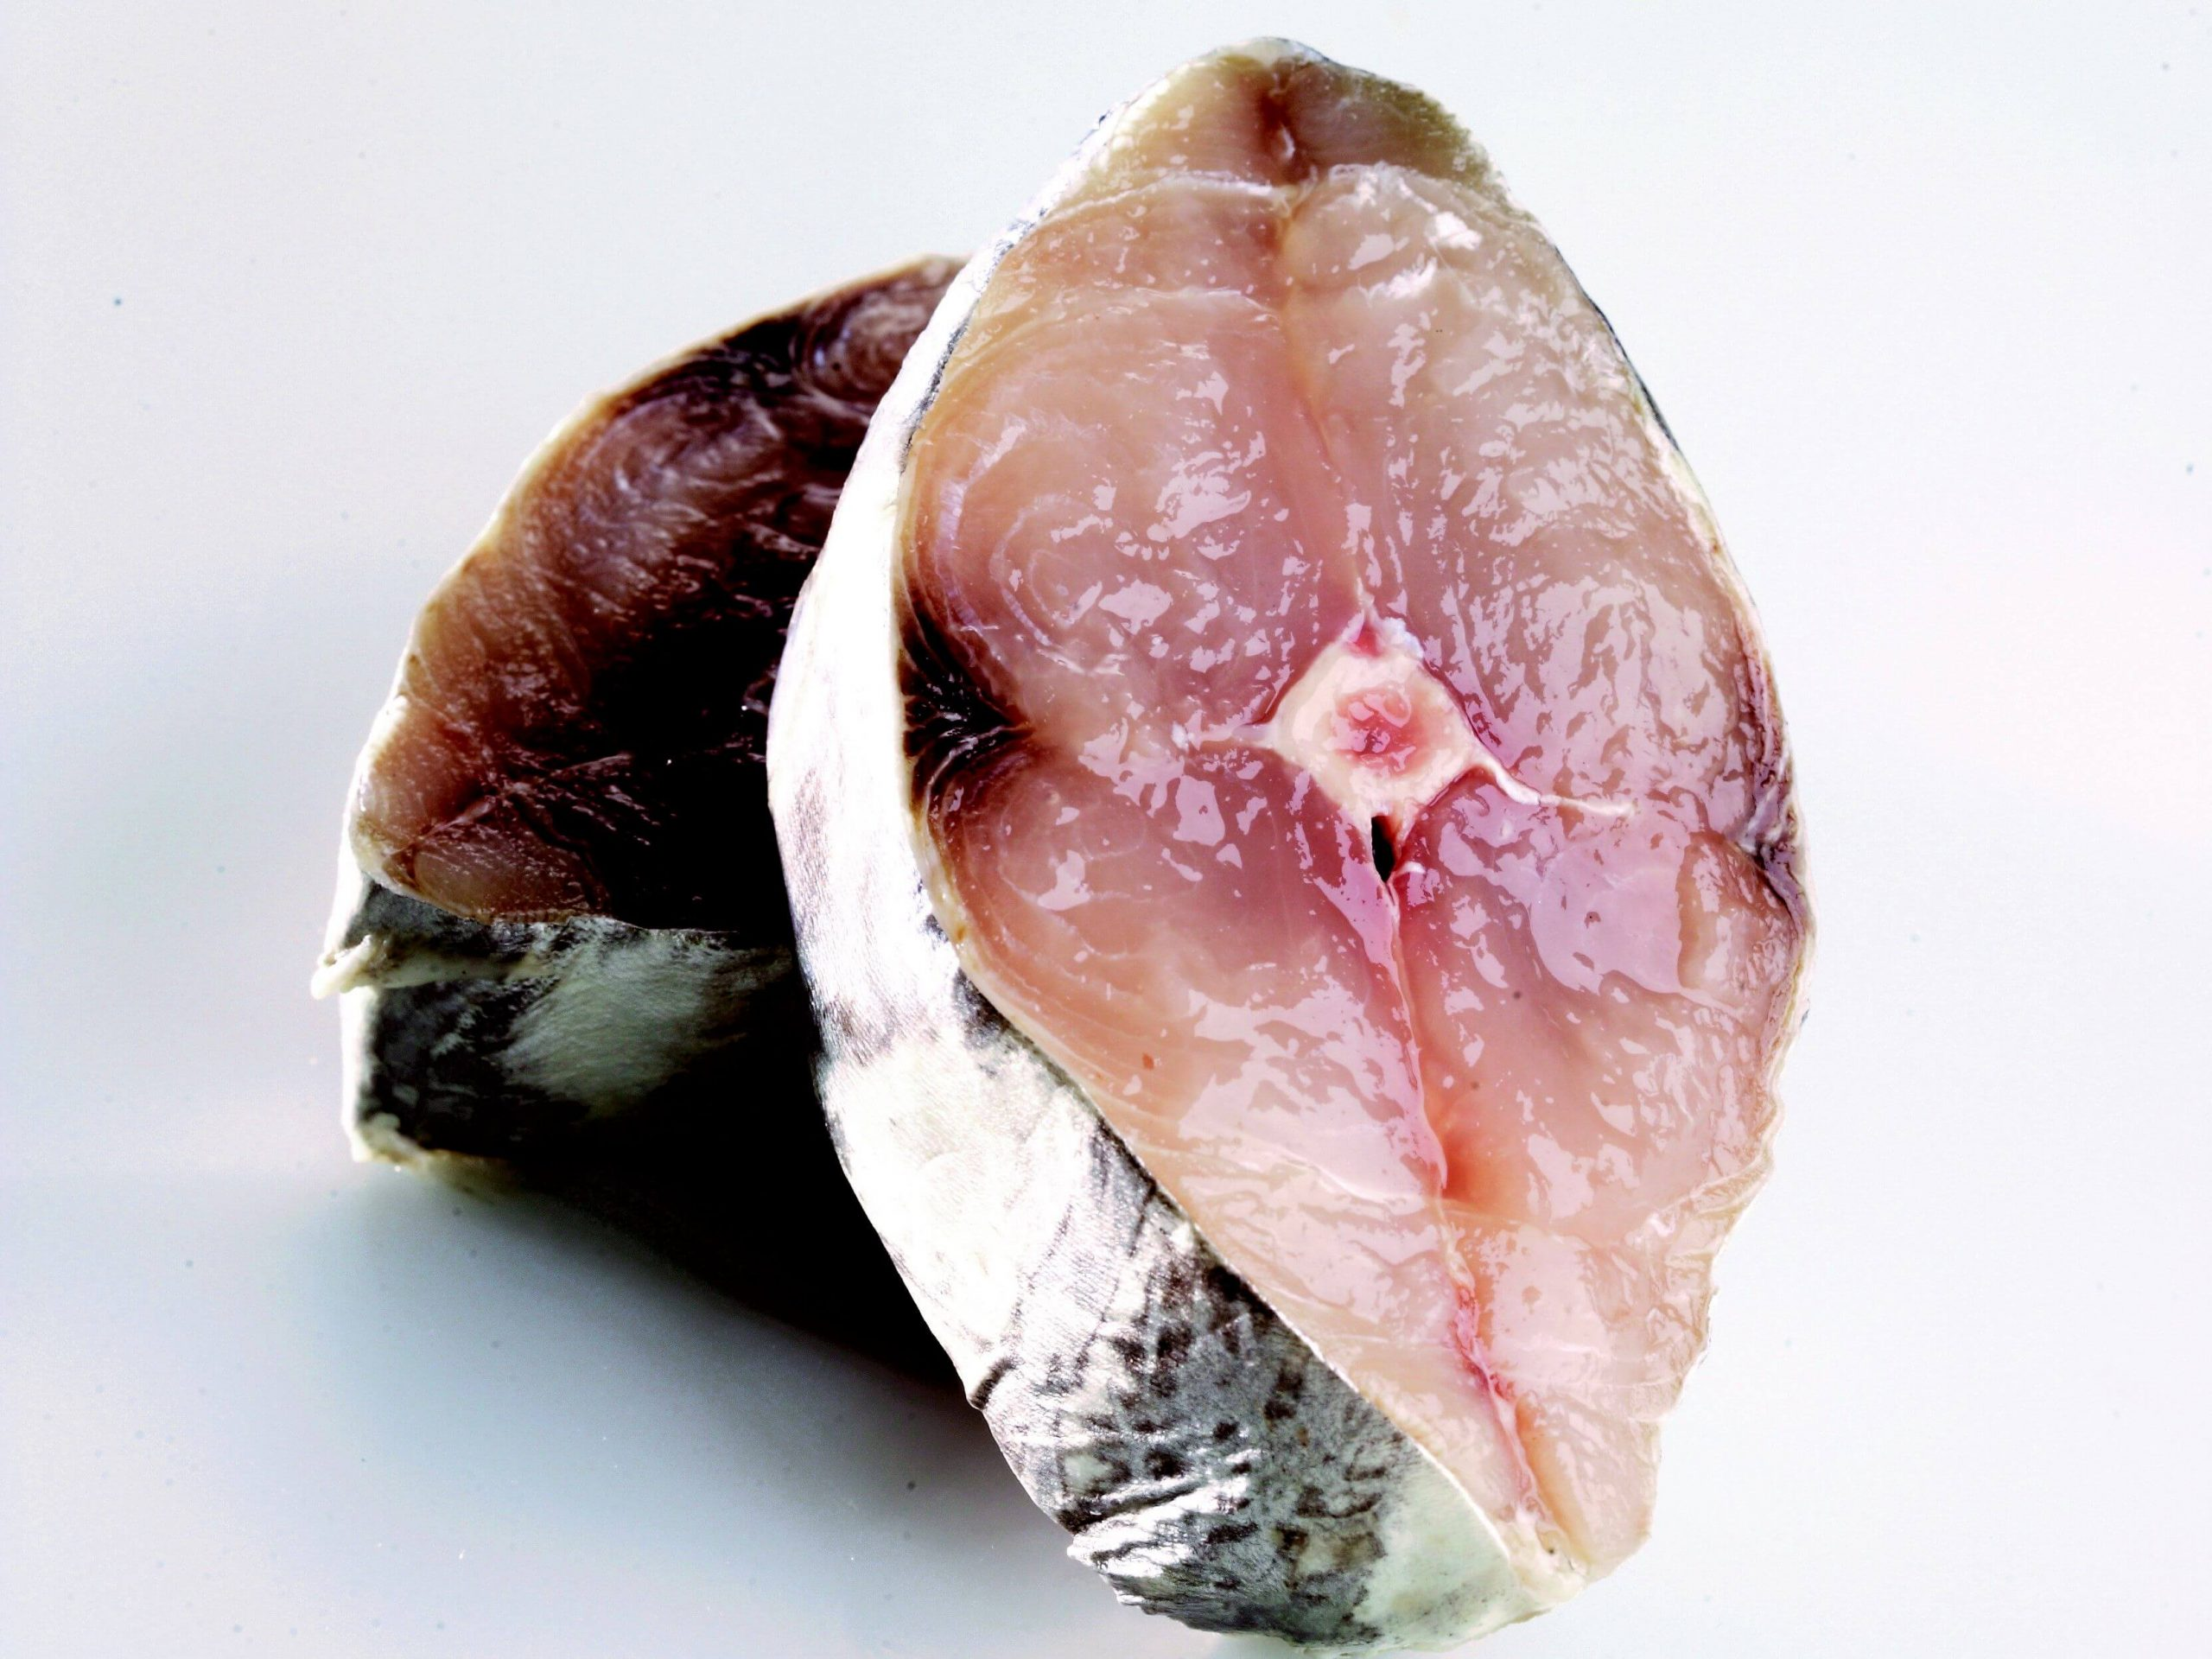 Kandungan Gizi Ikan Konsumsi yang Kaya Akan Nutrisi